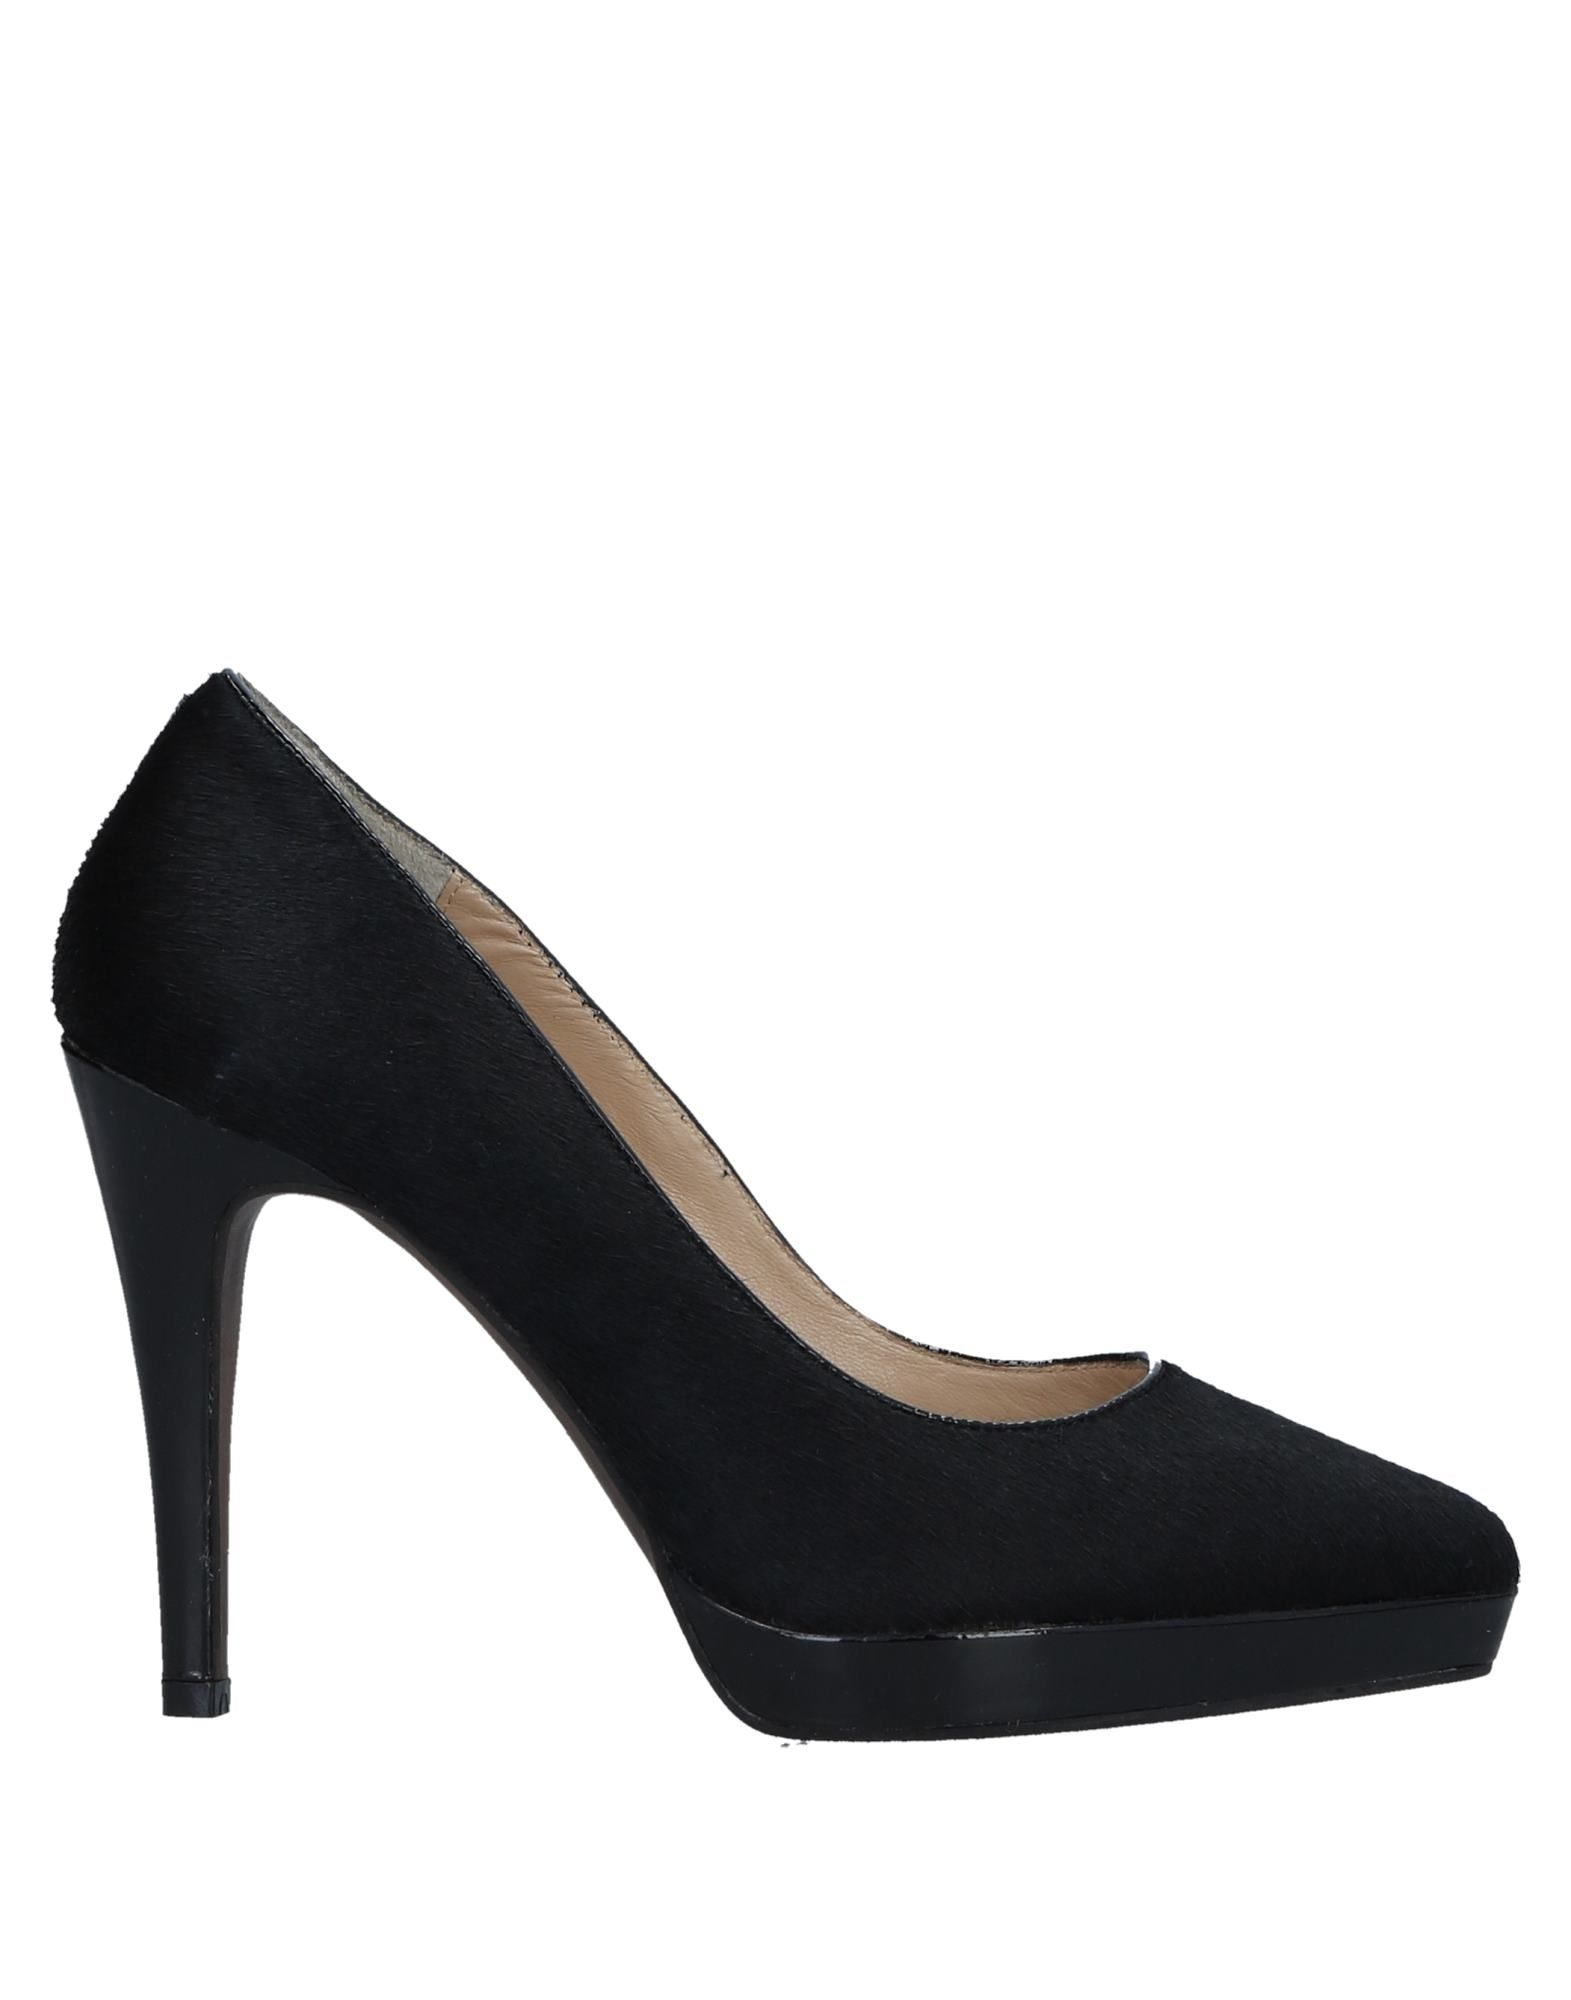 Bruno Premi Pumps Damen  Schuhe 11538129GN Gute Qualität beliebte Schuhe  b62dd7